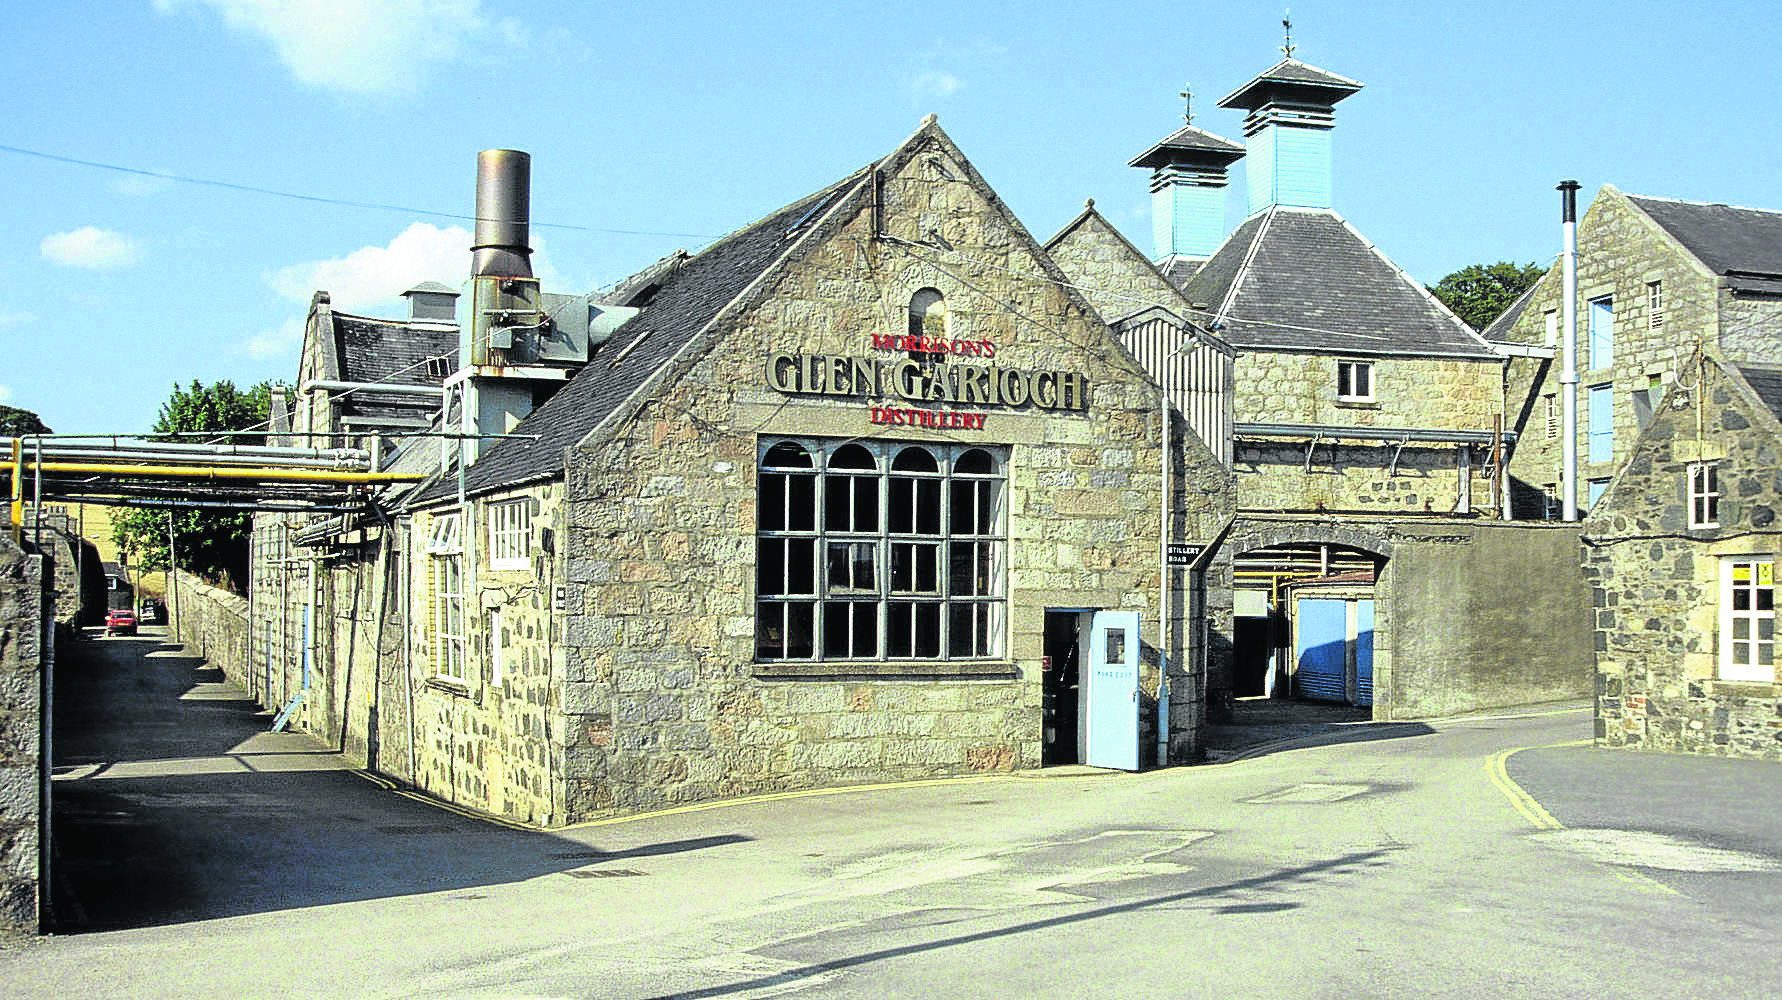 The event will be held at the Glen Garioch Distillery